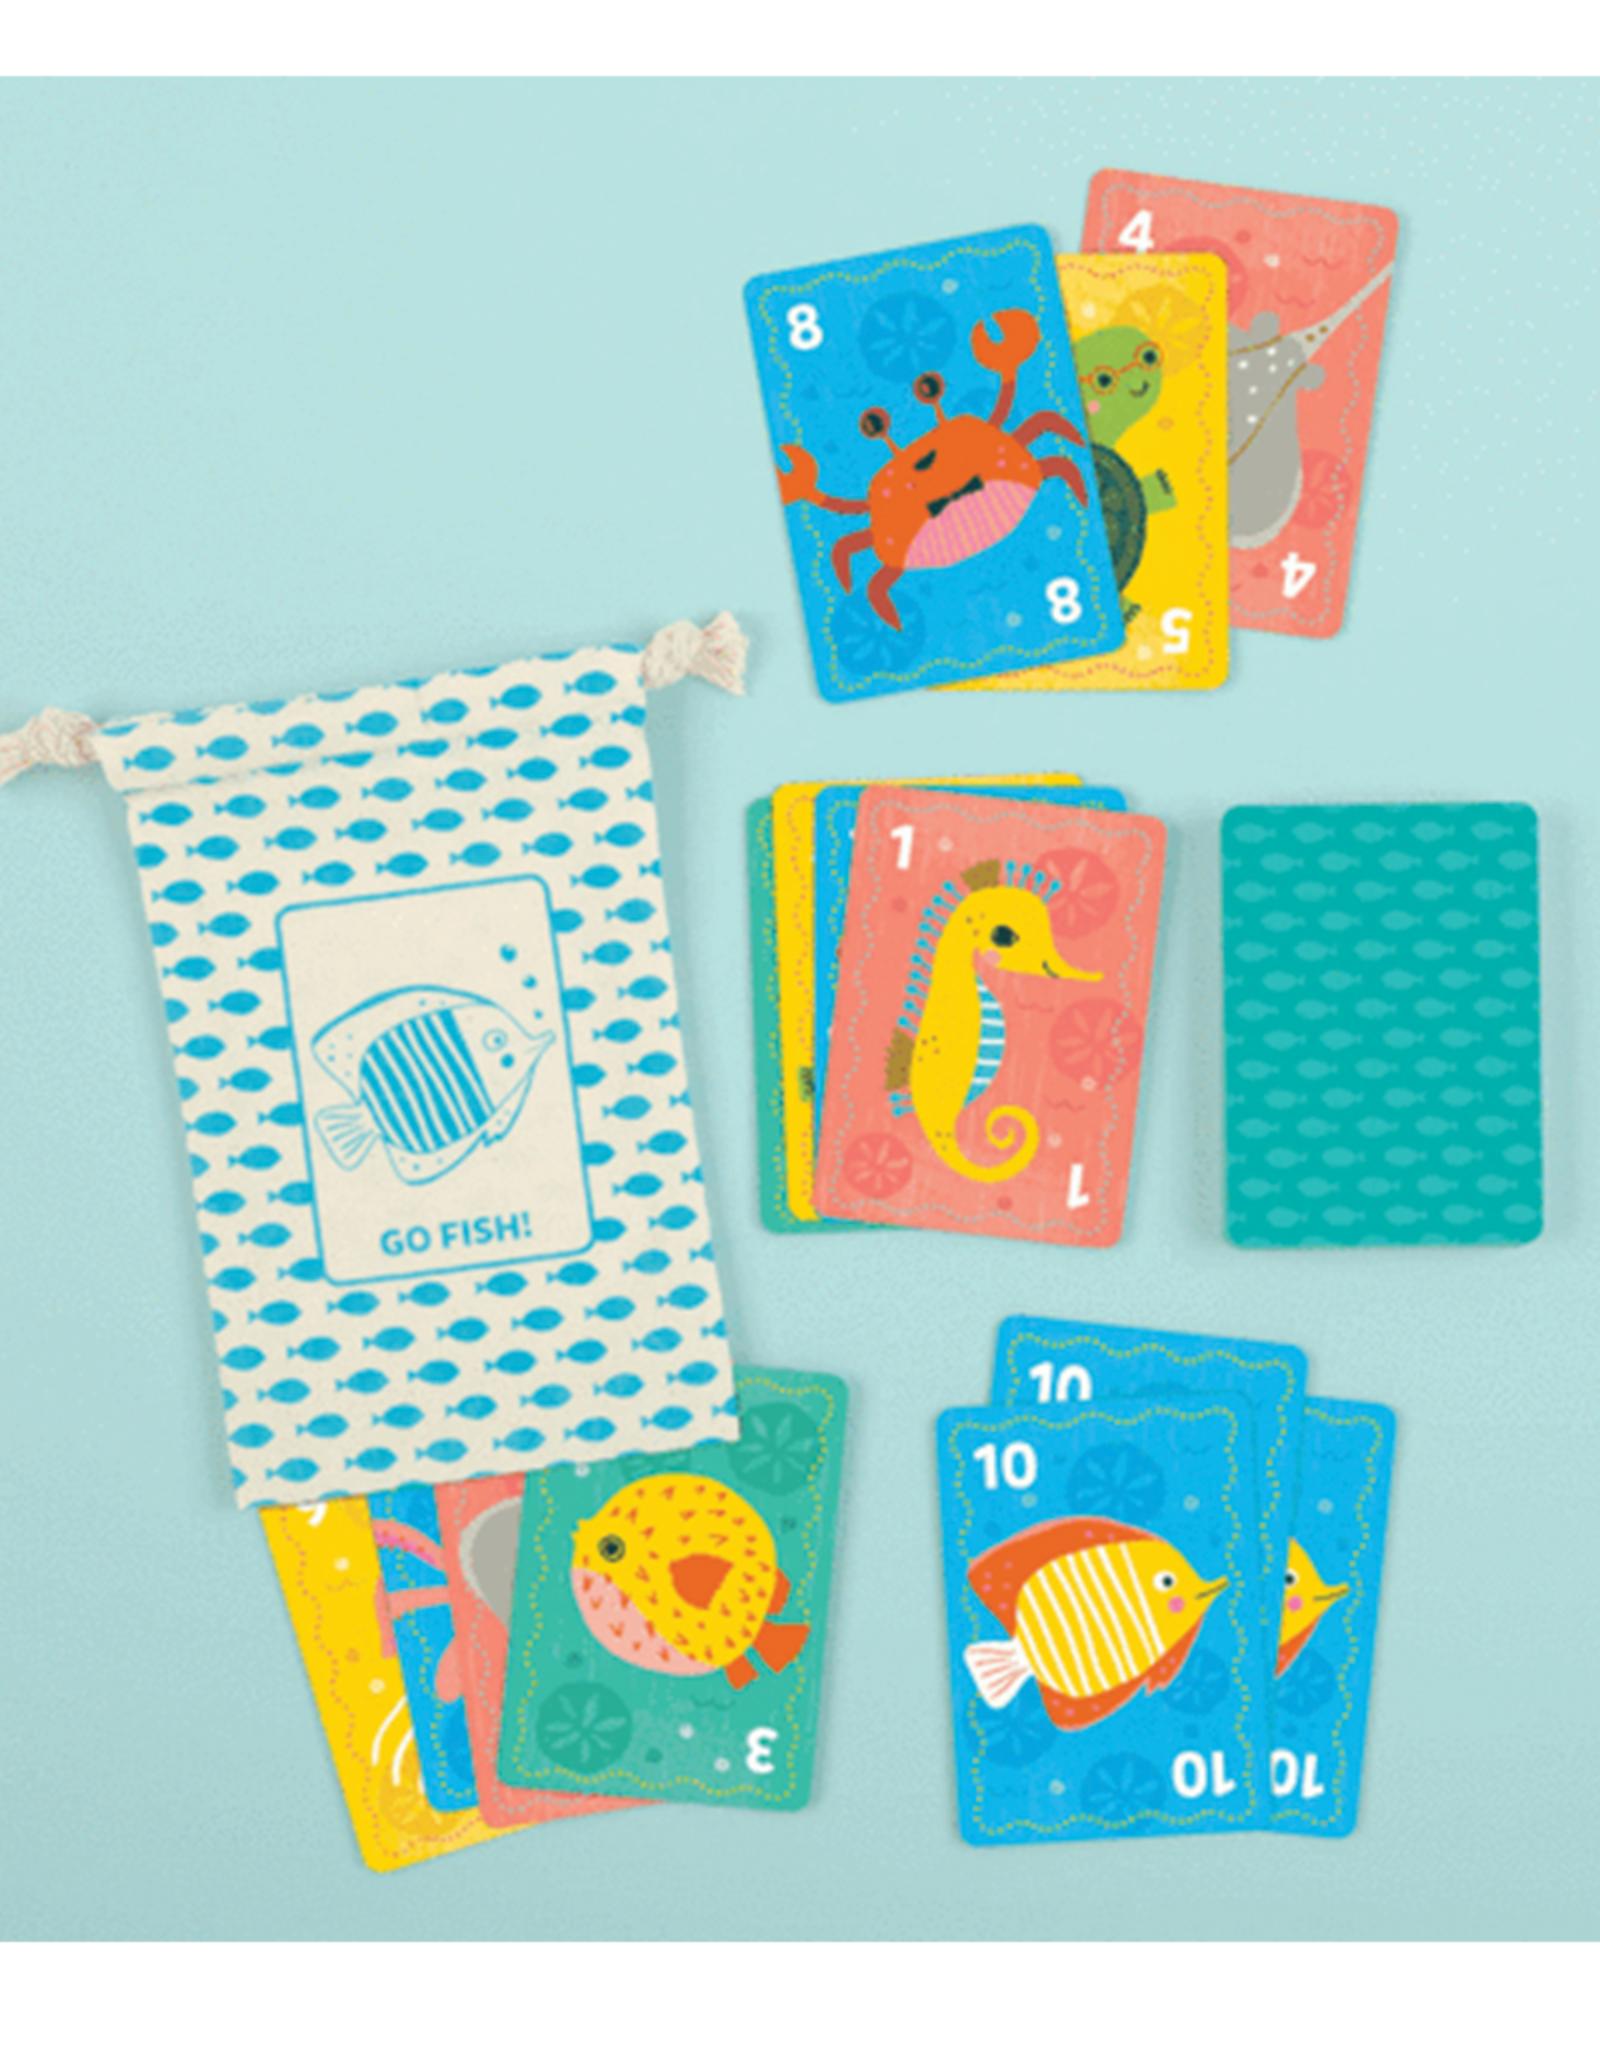 Mudpuppy Go Fish! Card Game to Go